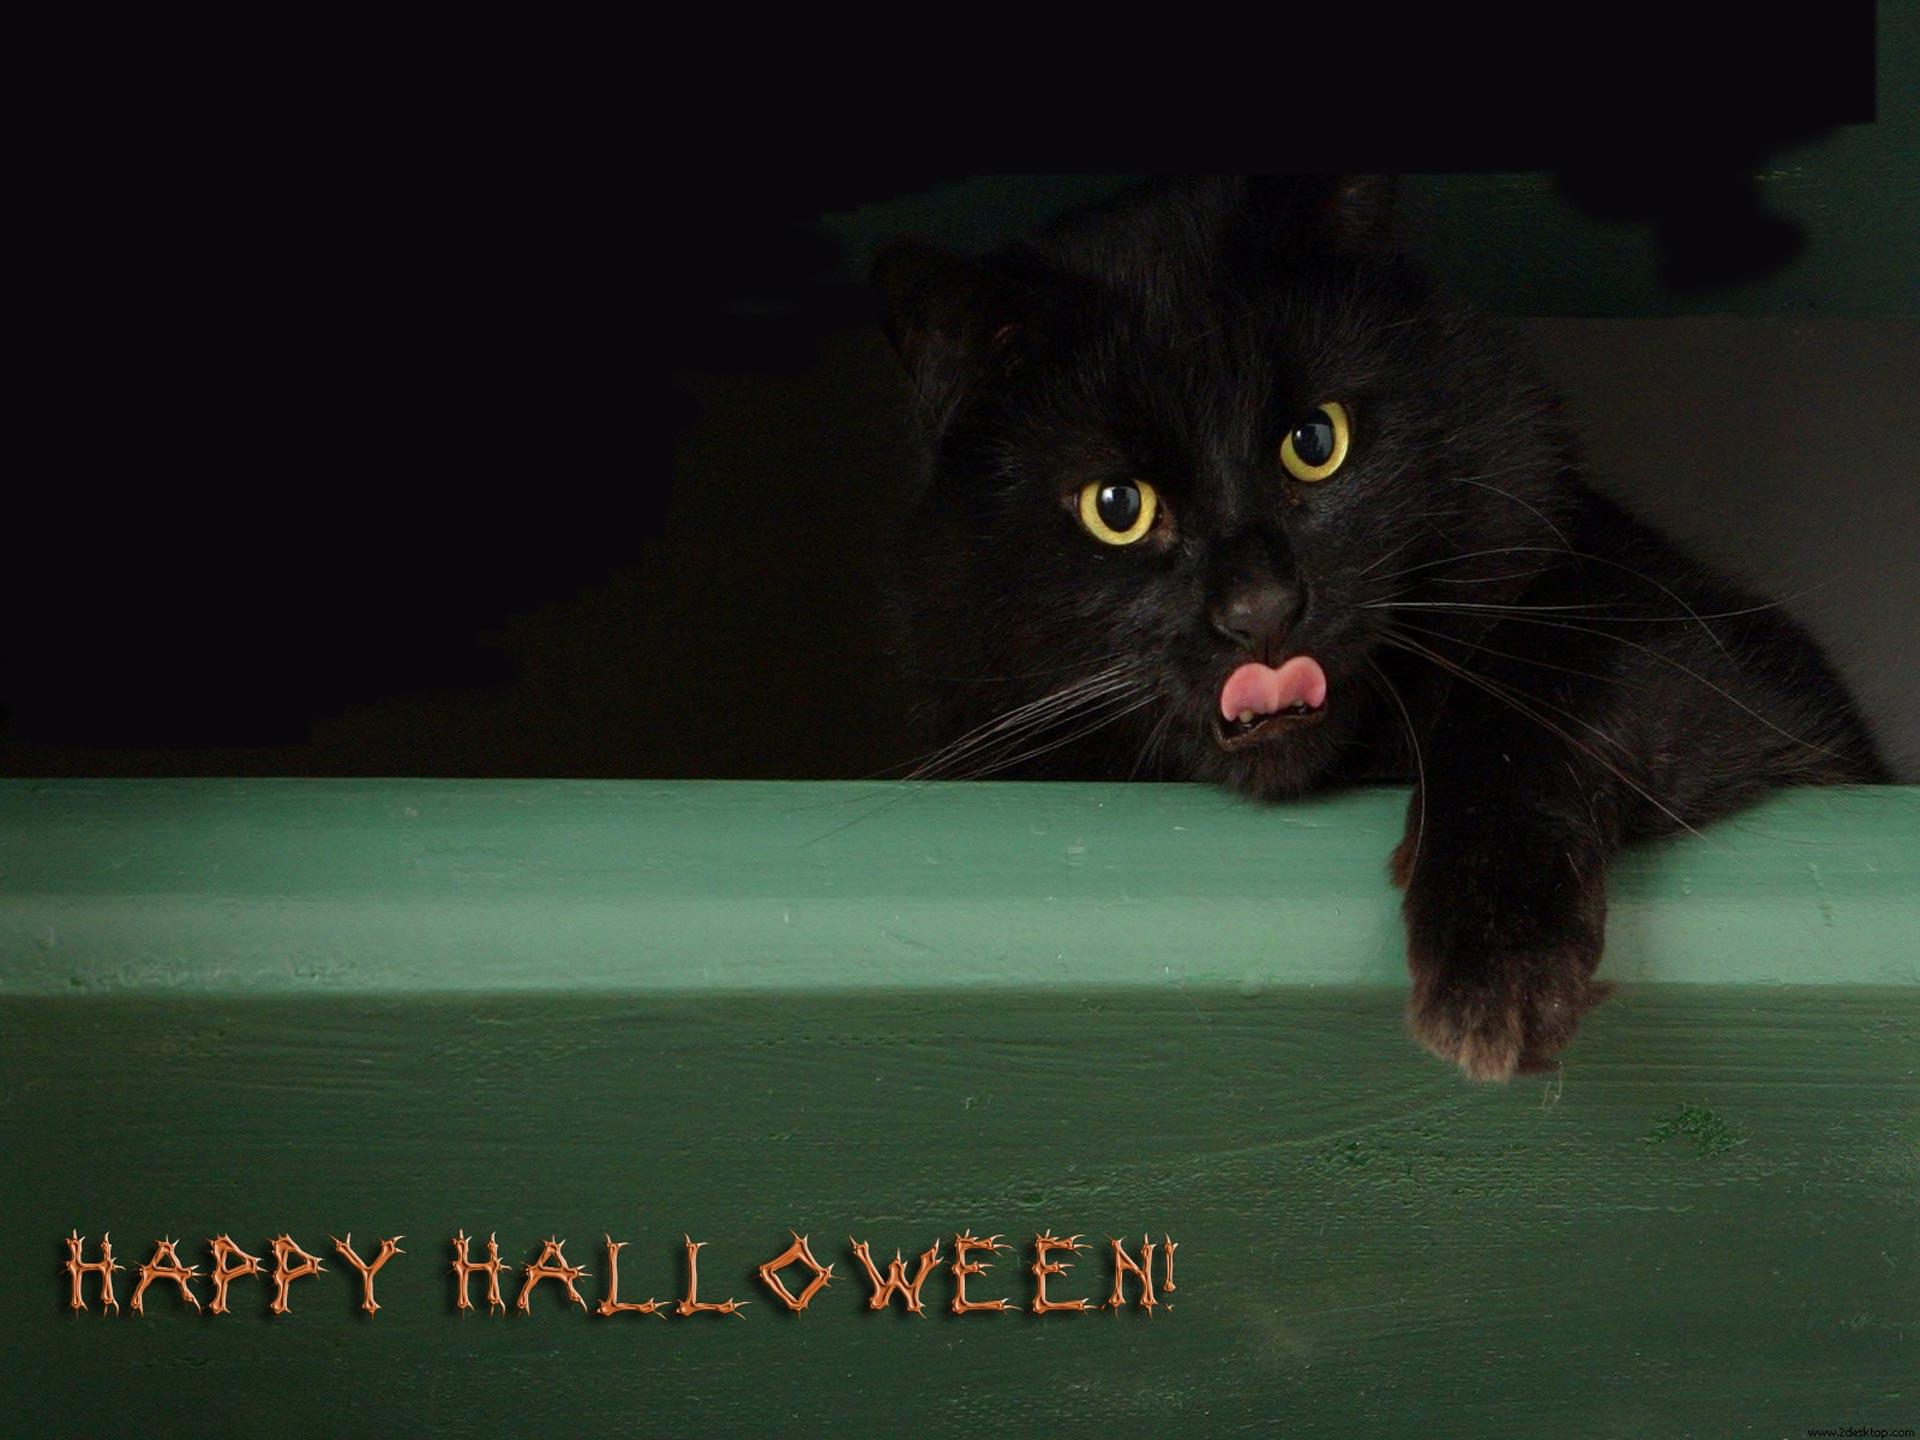 Happy_Halloween_All_Saints__Day.jpg